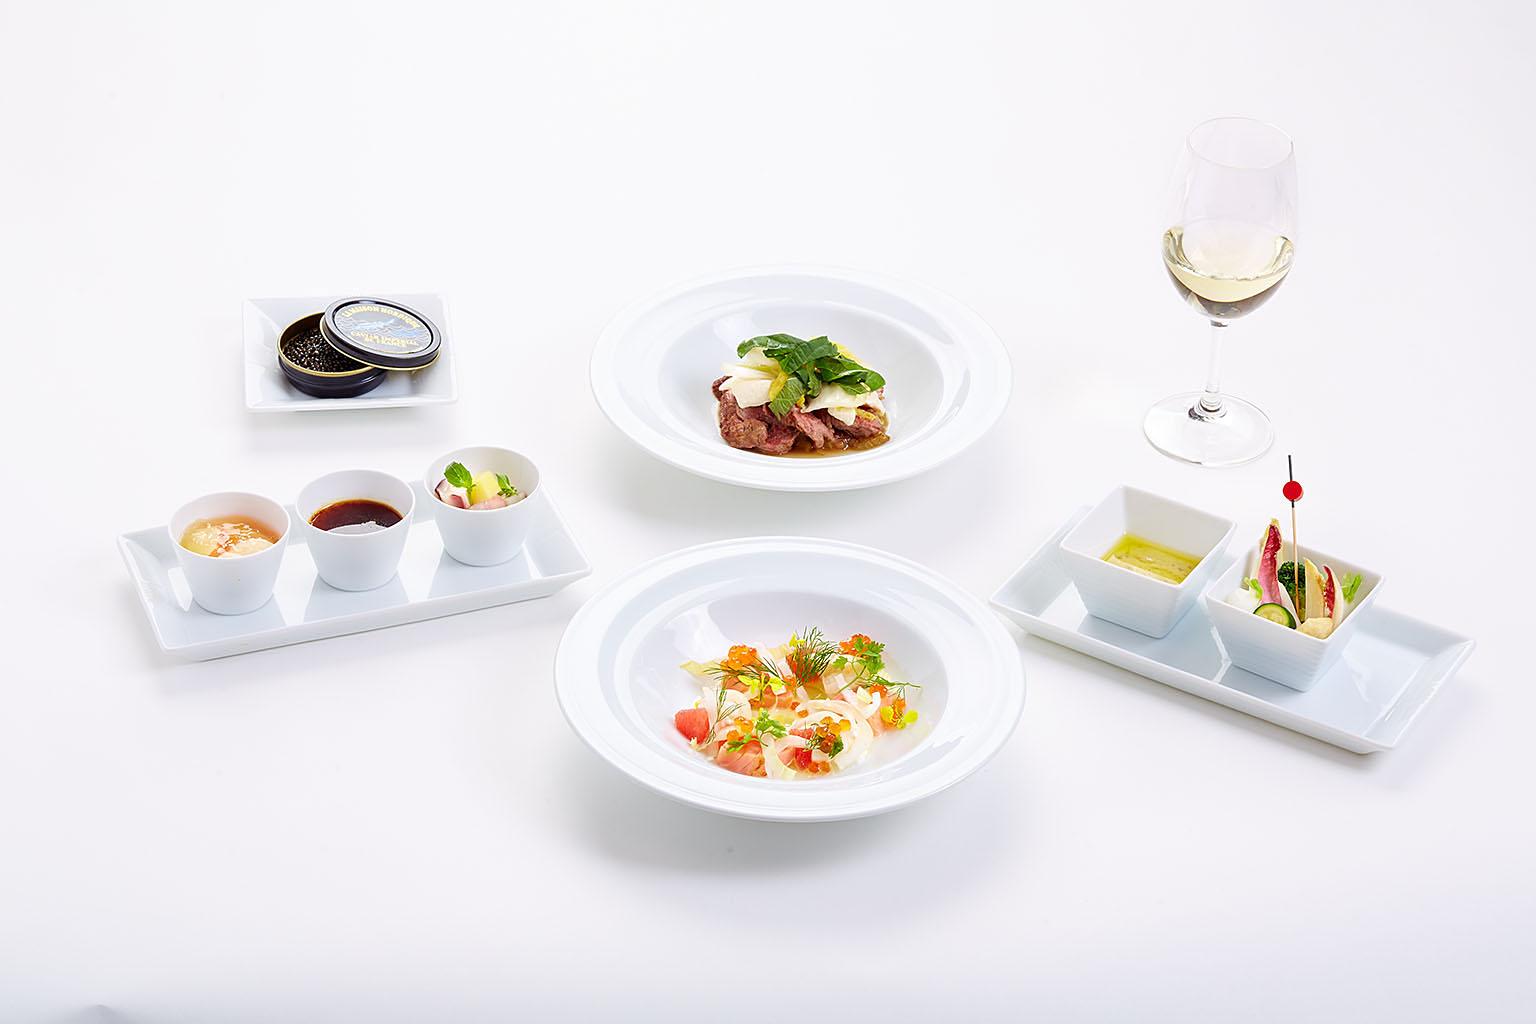 in-flight menu for Japan Airlines